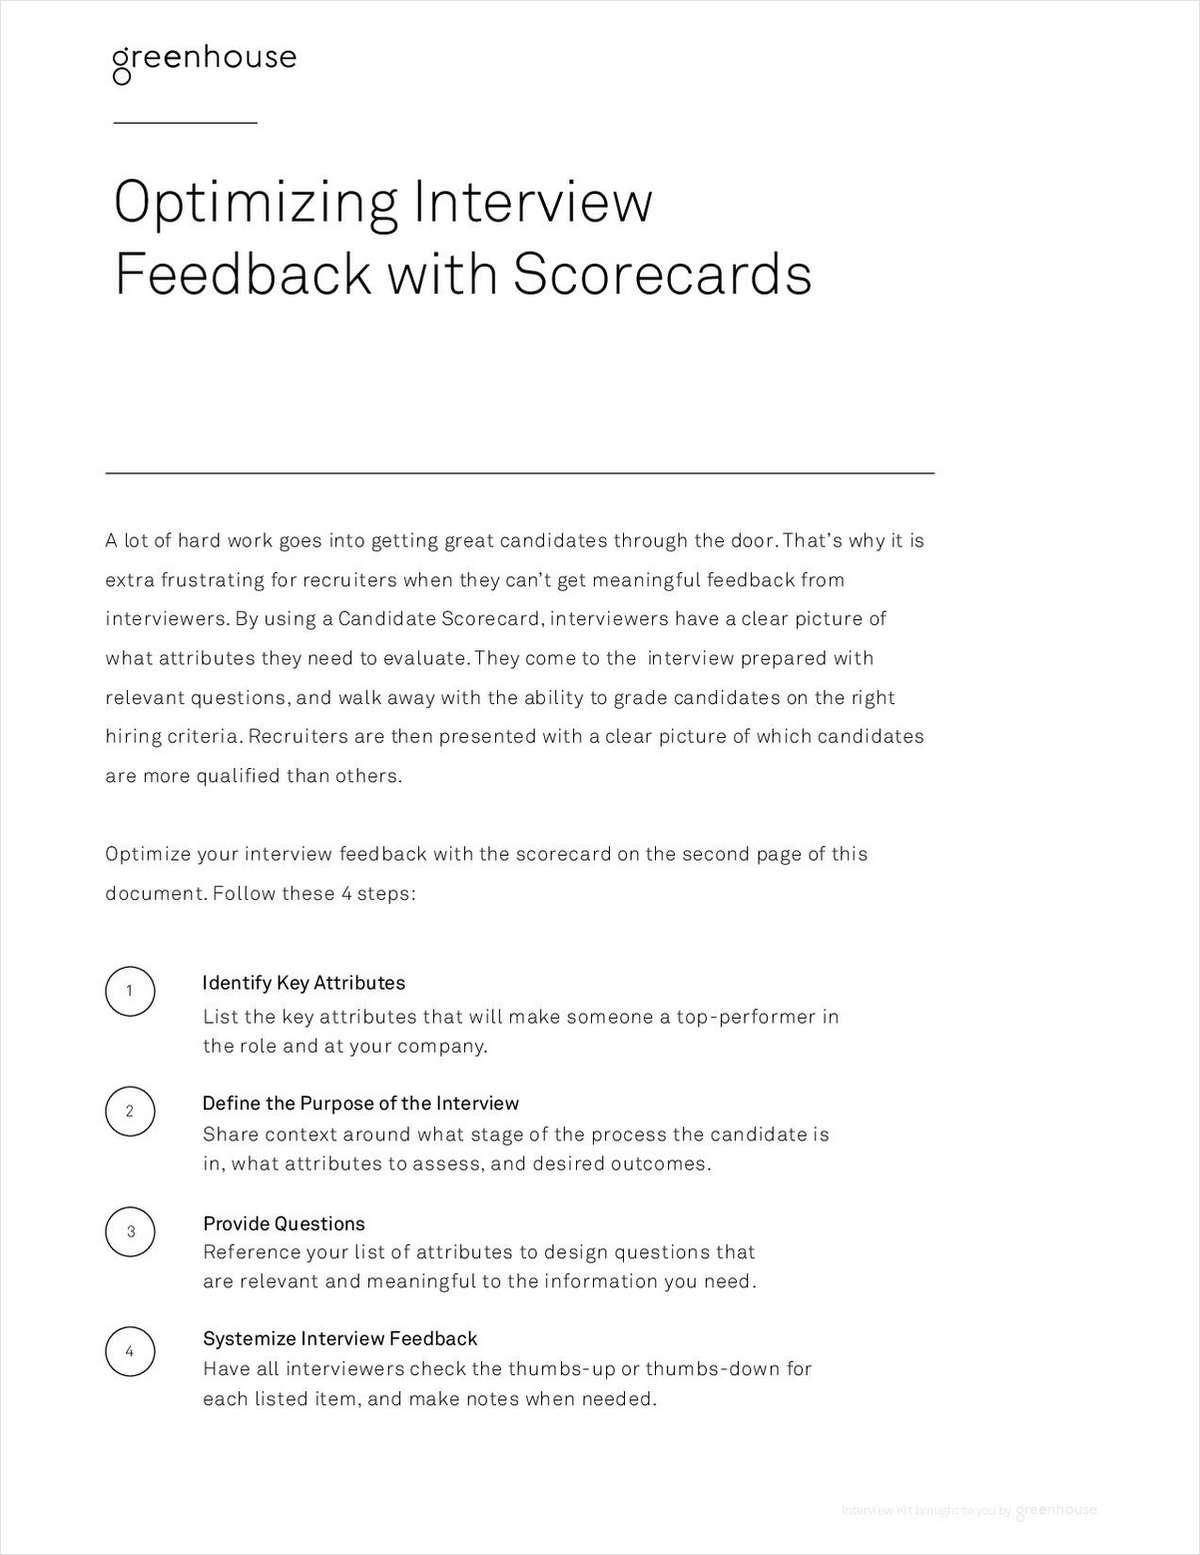 Interview Feedback Scorecard